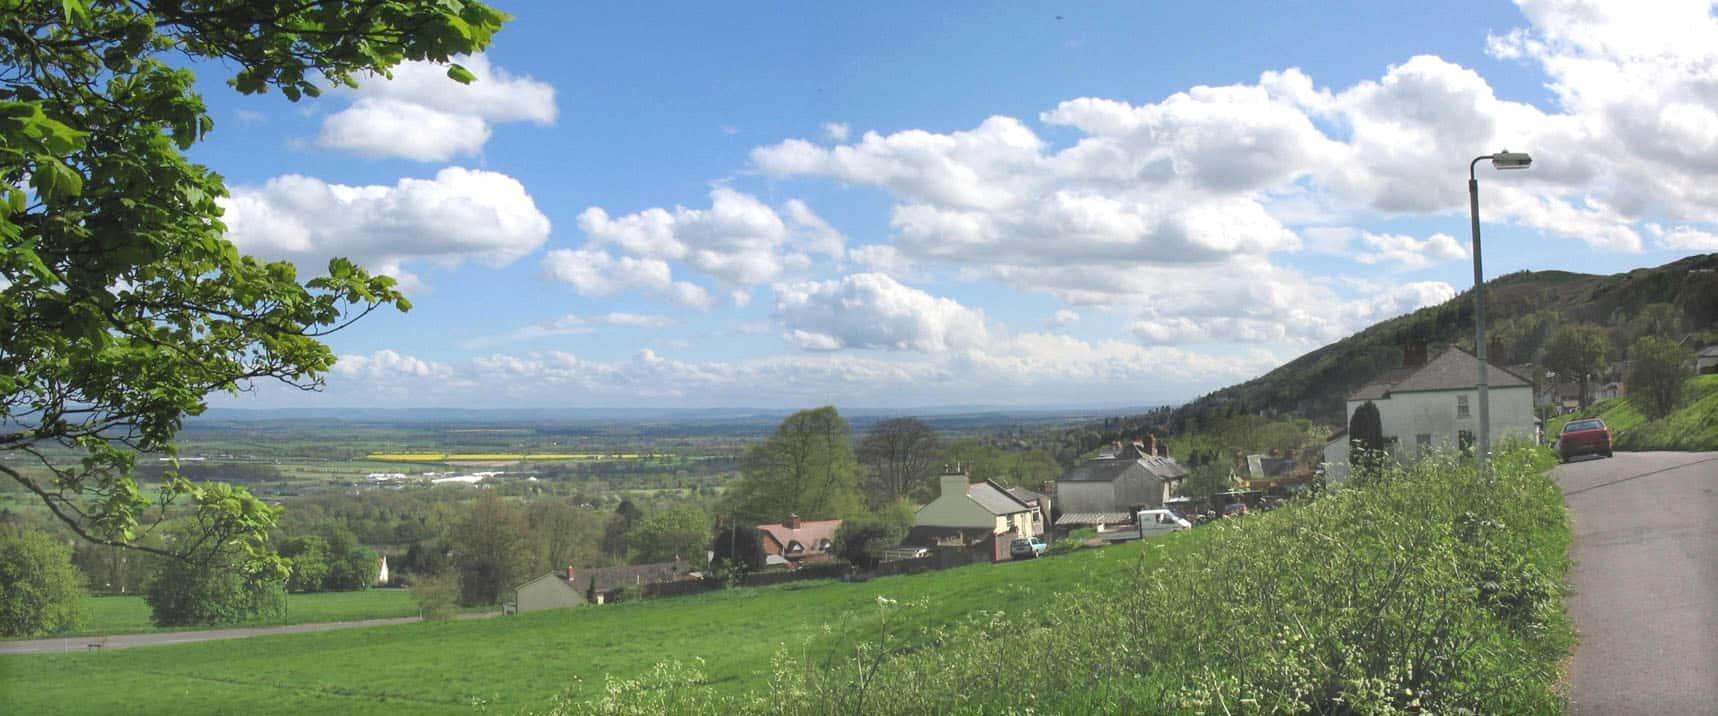 Severn Valley and Malvern Hills